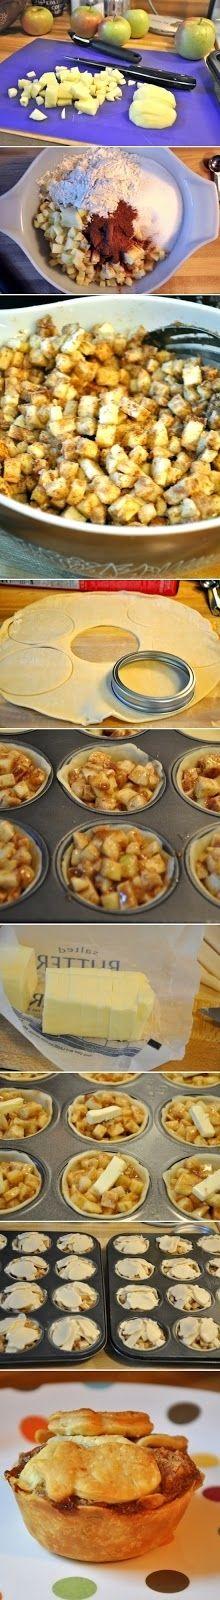 Mini Apple Pies    |    24 Awesome Muffin TinRecipes